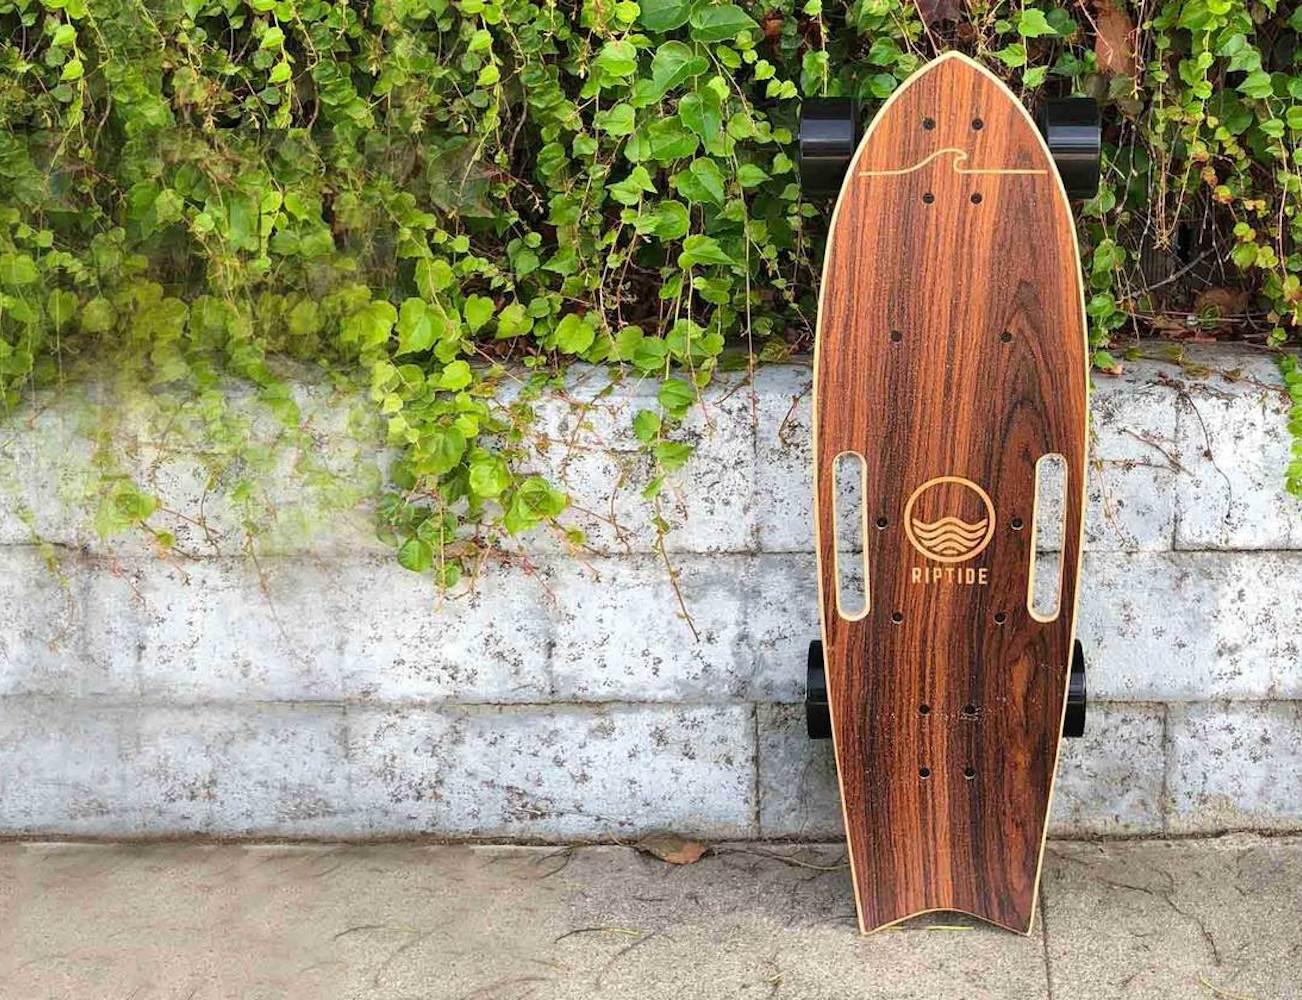 Riptide R1X Fast Electric Skateboard can take you far